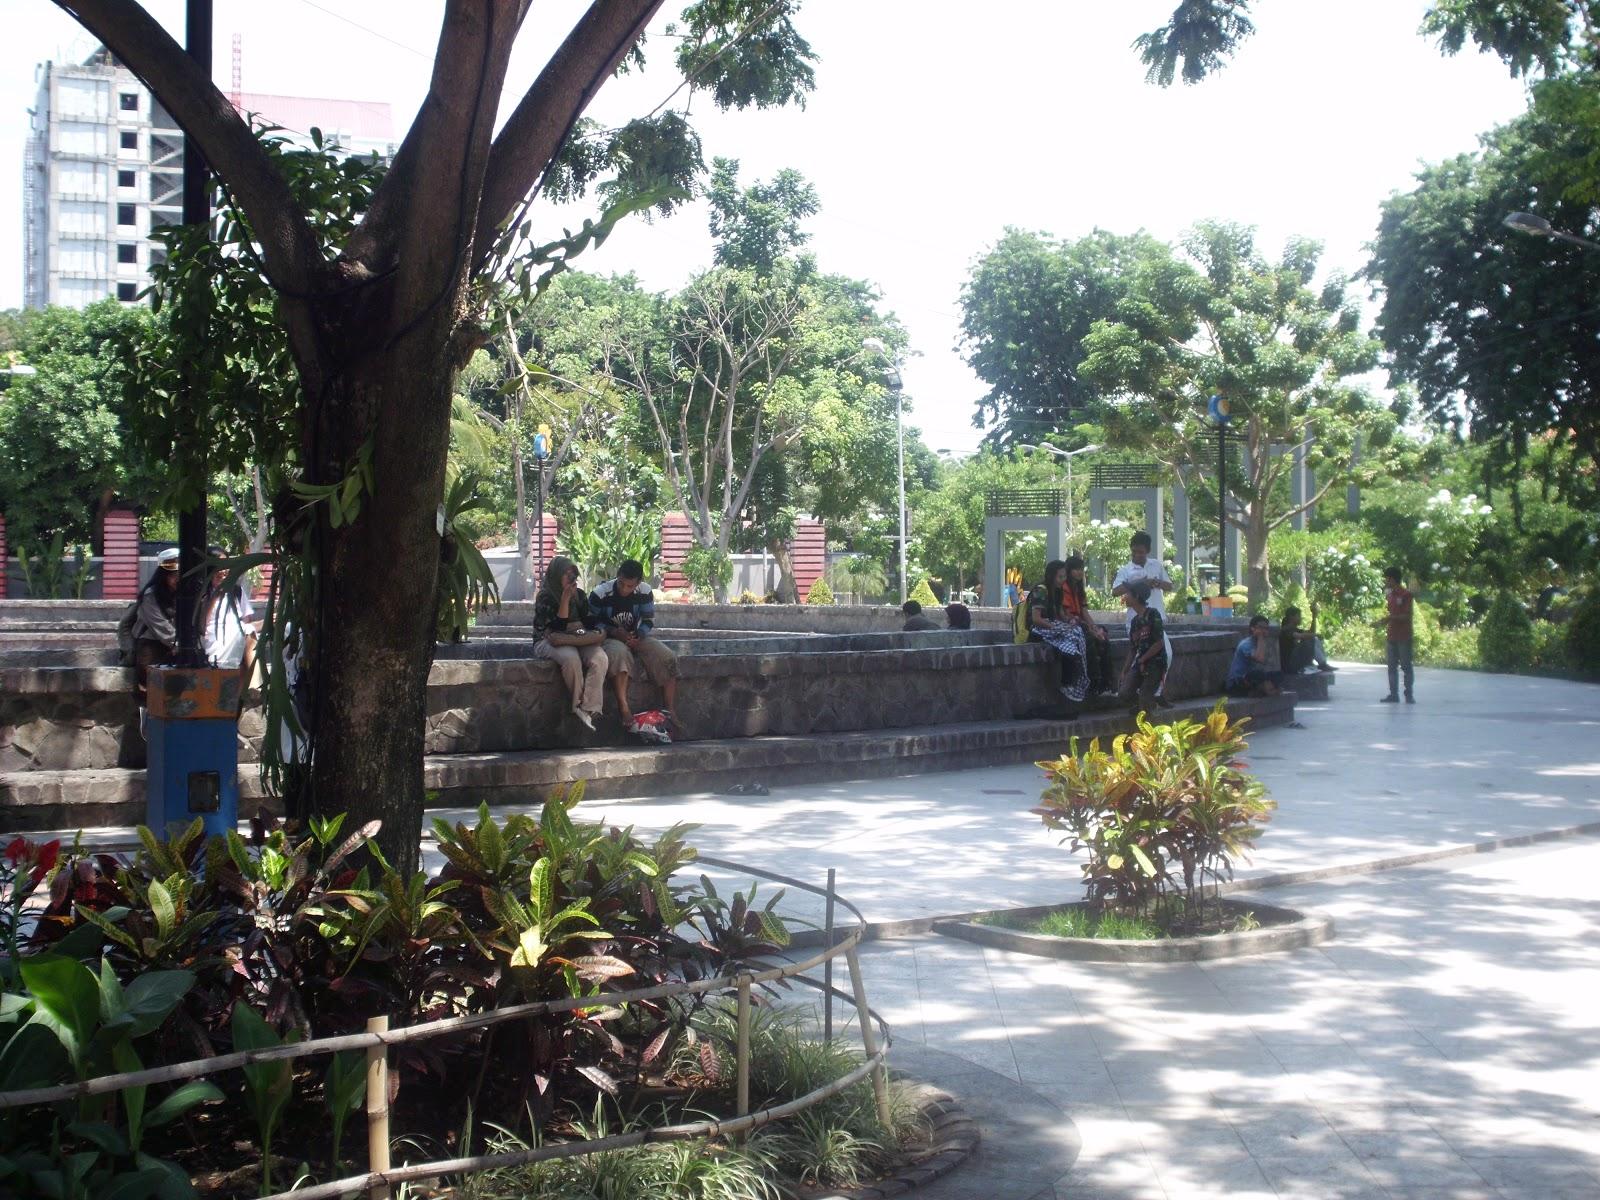 Taman Bungkul Surabaya Sisi Lain Kota